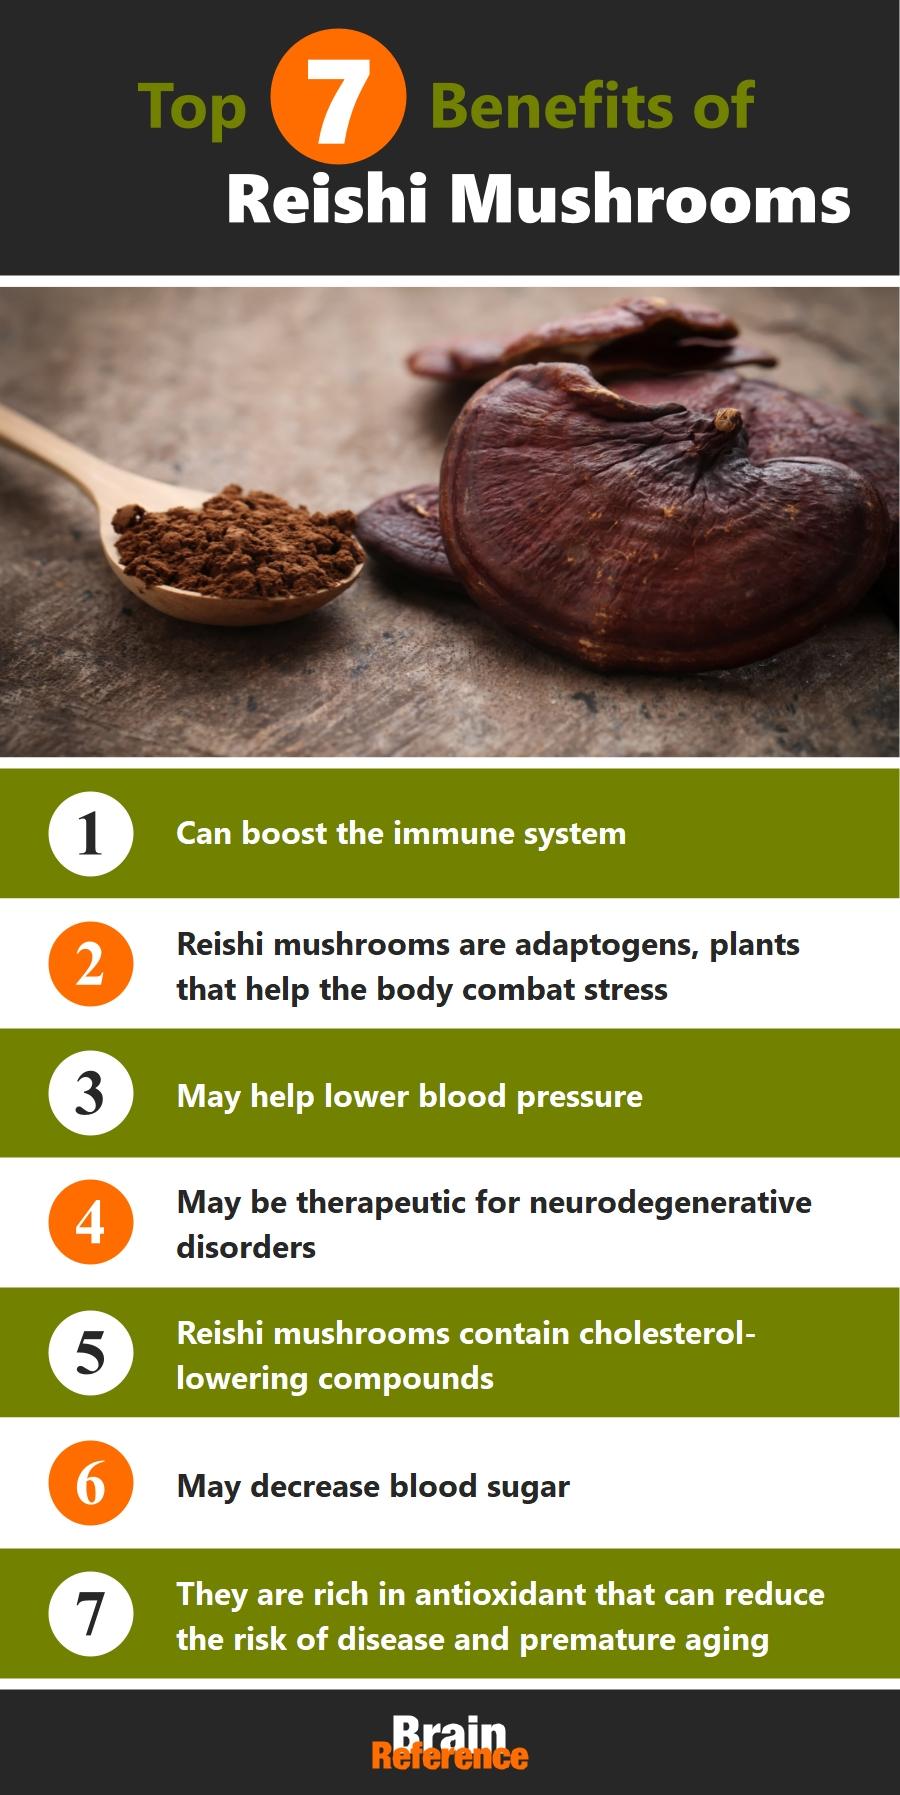 Genius-Mushrooms-The-Genius-Brand-Reishi-Mushroom-Benefits